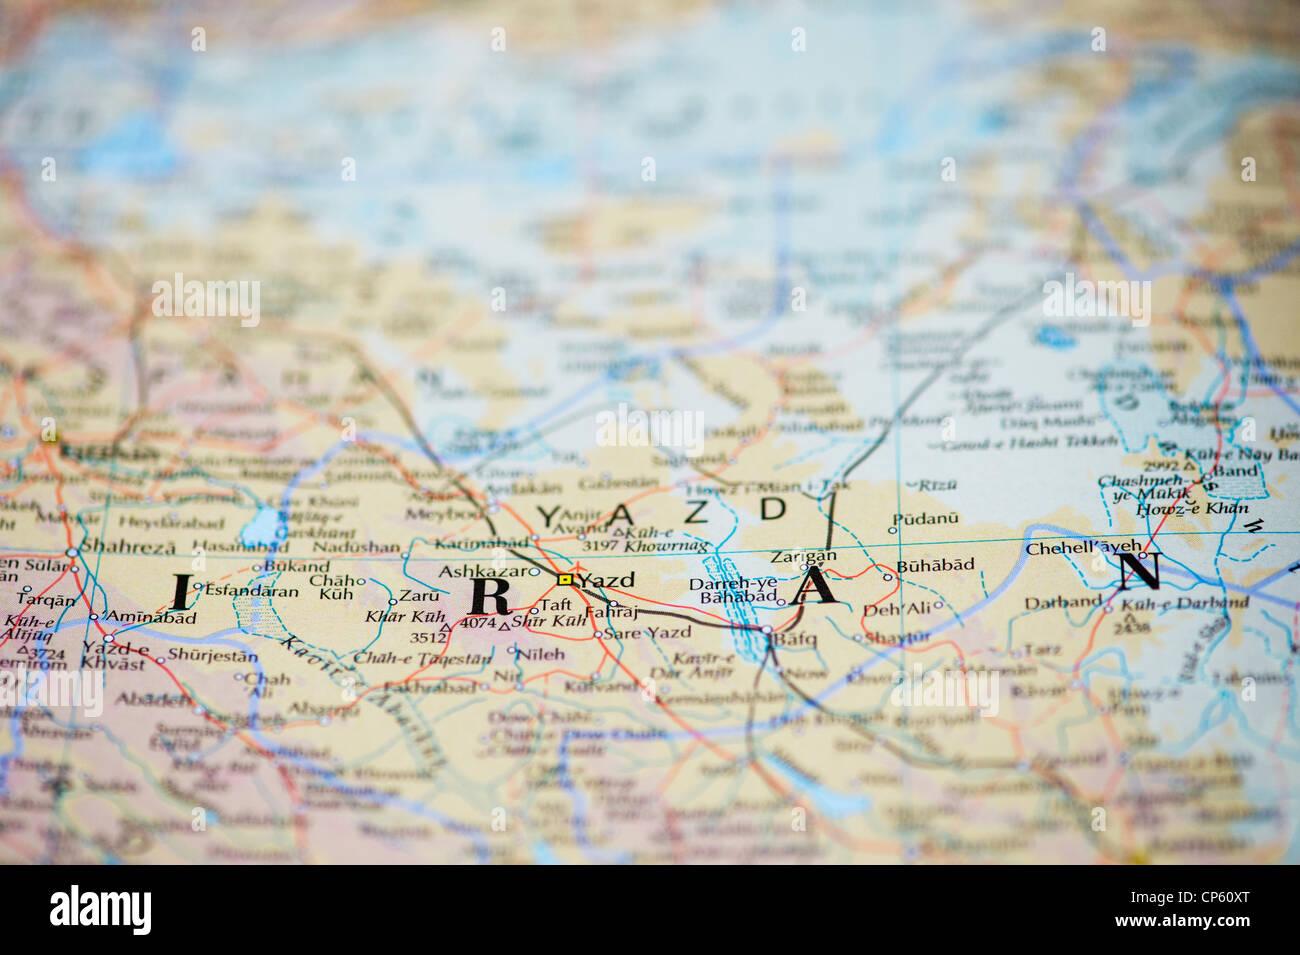 Map of Iran - Stock Image